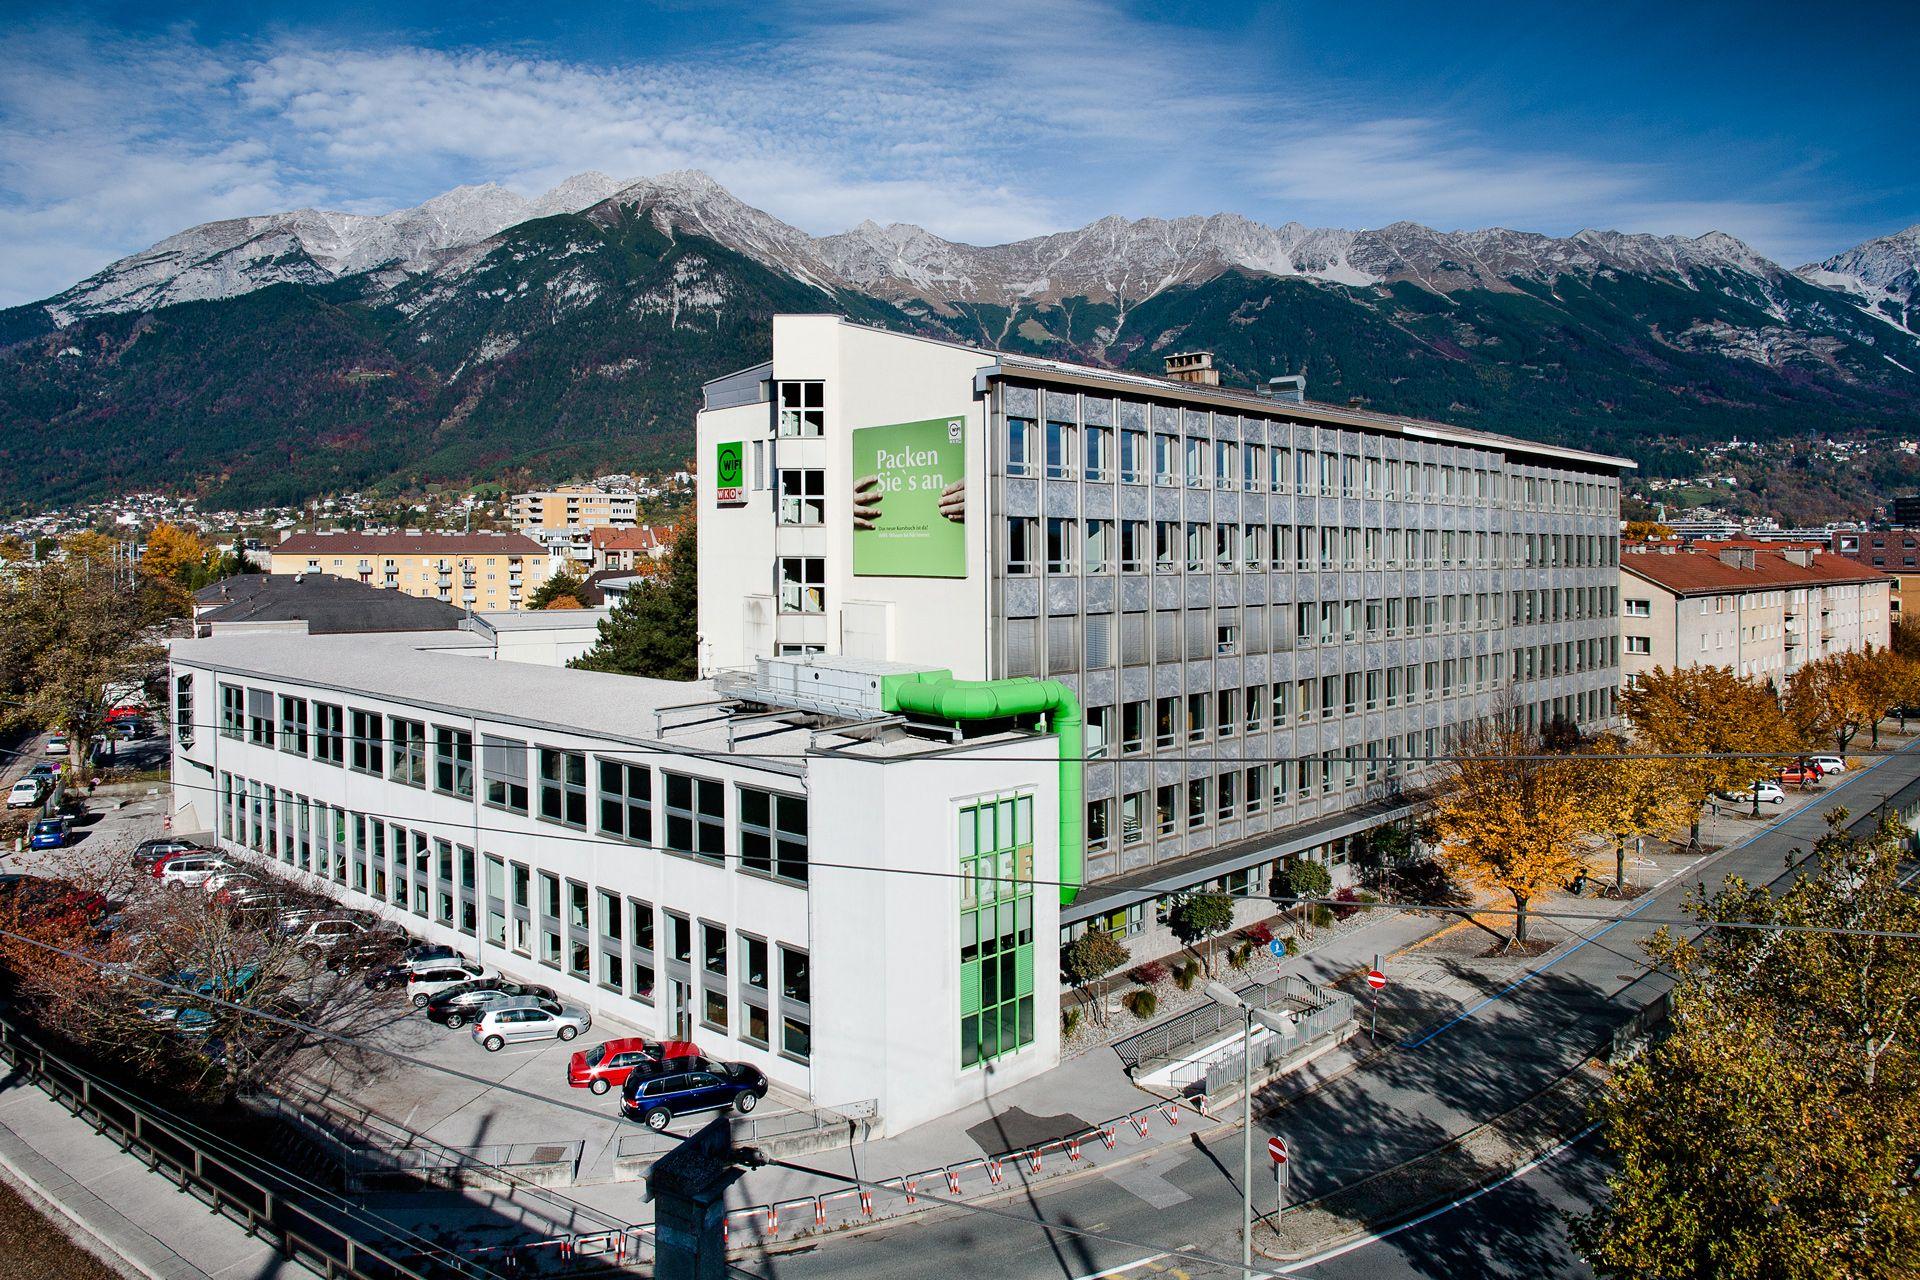 Wifi Tirol Innsbruck Mit Bildern Innsbruck Tirol